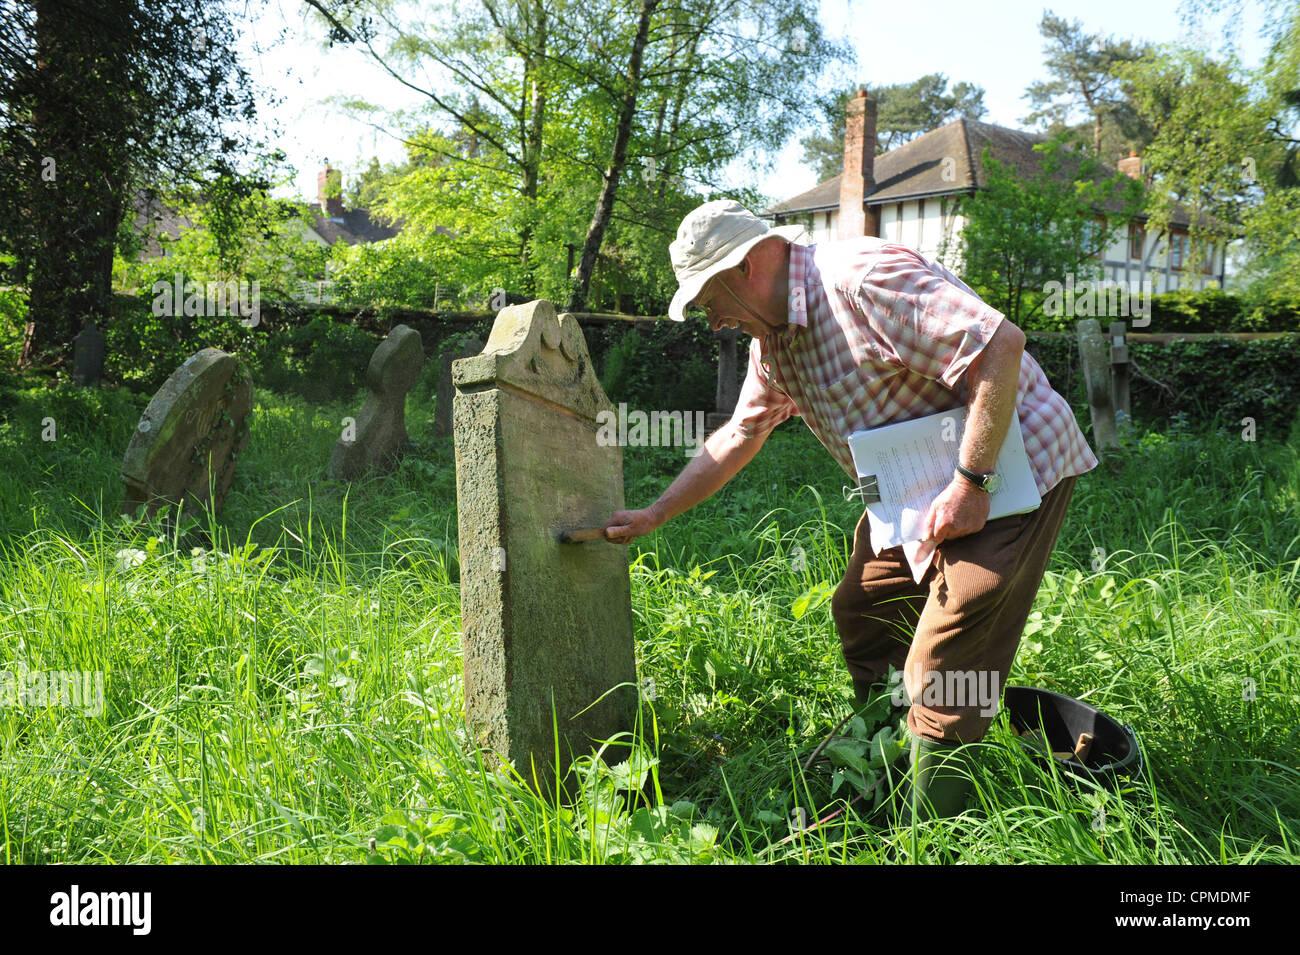 Genealogist David Petley-Jones cleaning a gravestone at Worthen church yard Uk - Stock Image